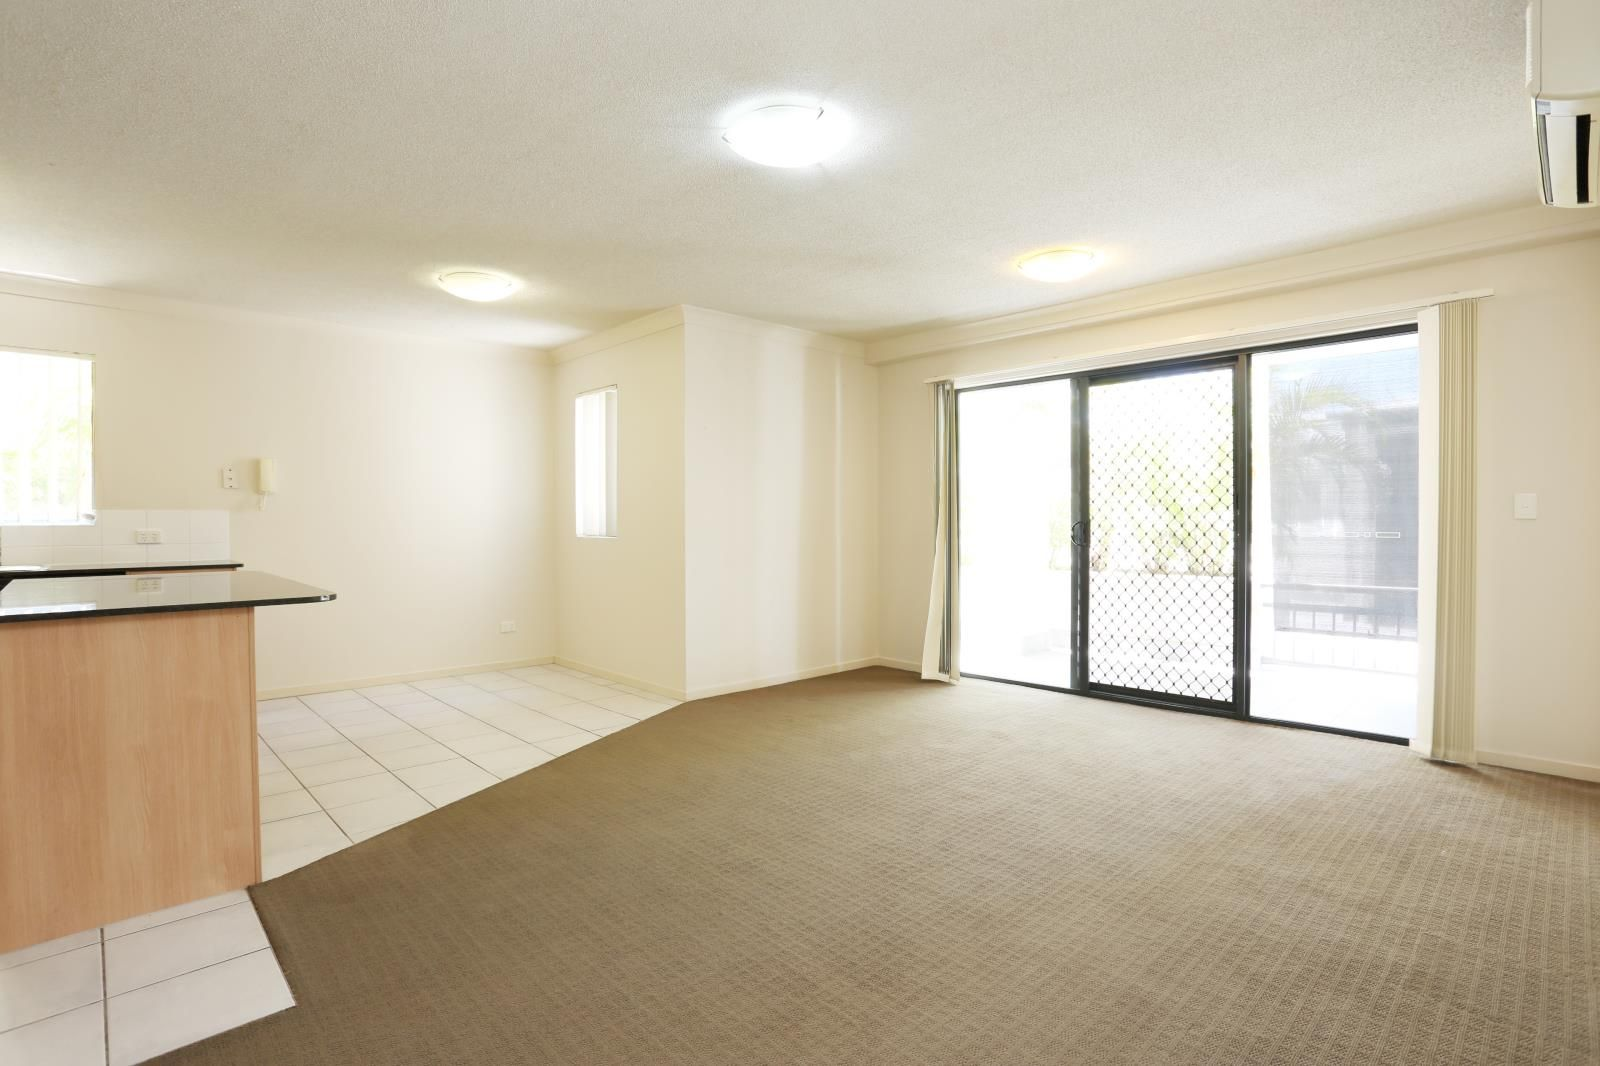 5/46-48 Lennerberg Street, Southport QLD 4215, Image 2